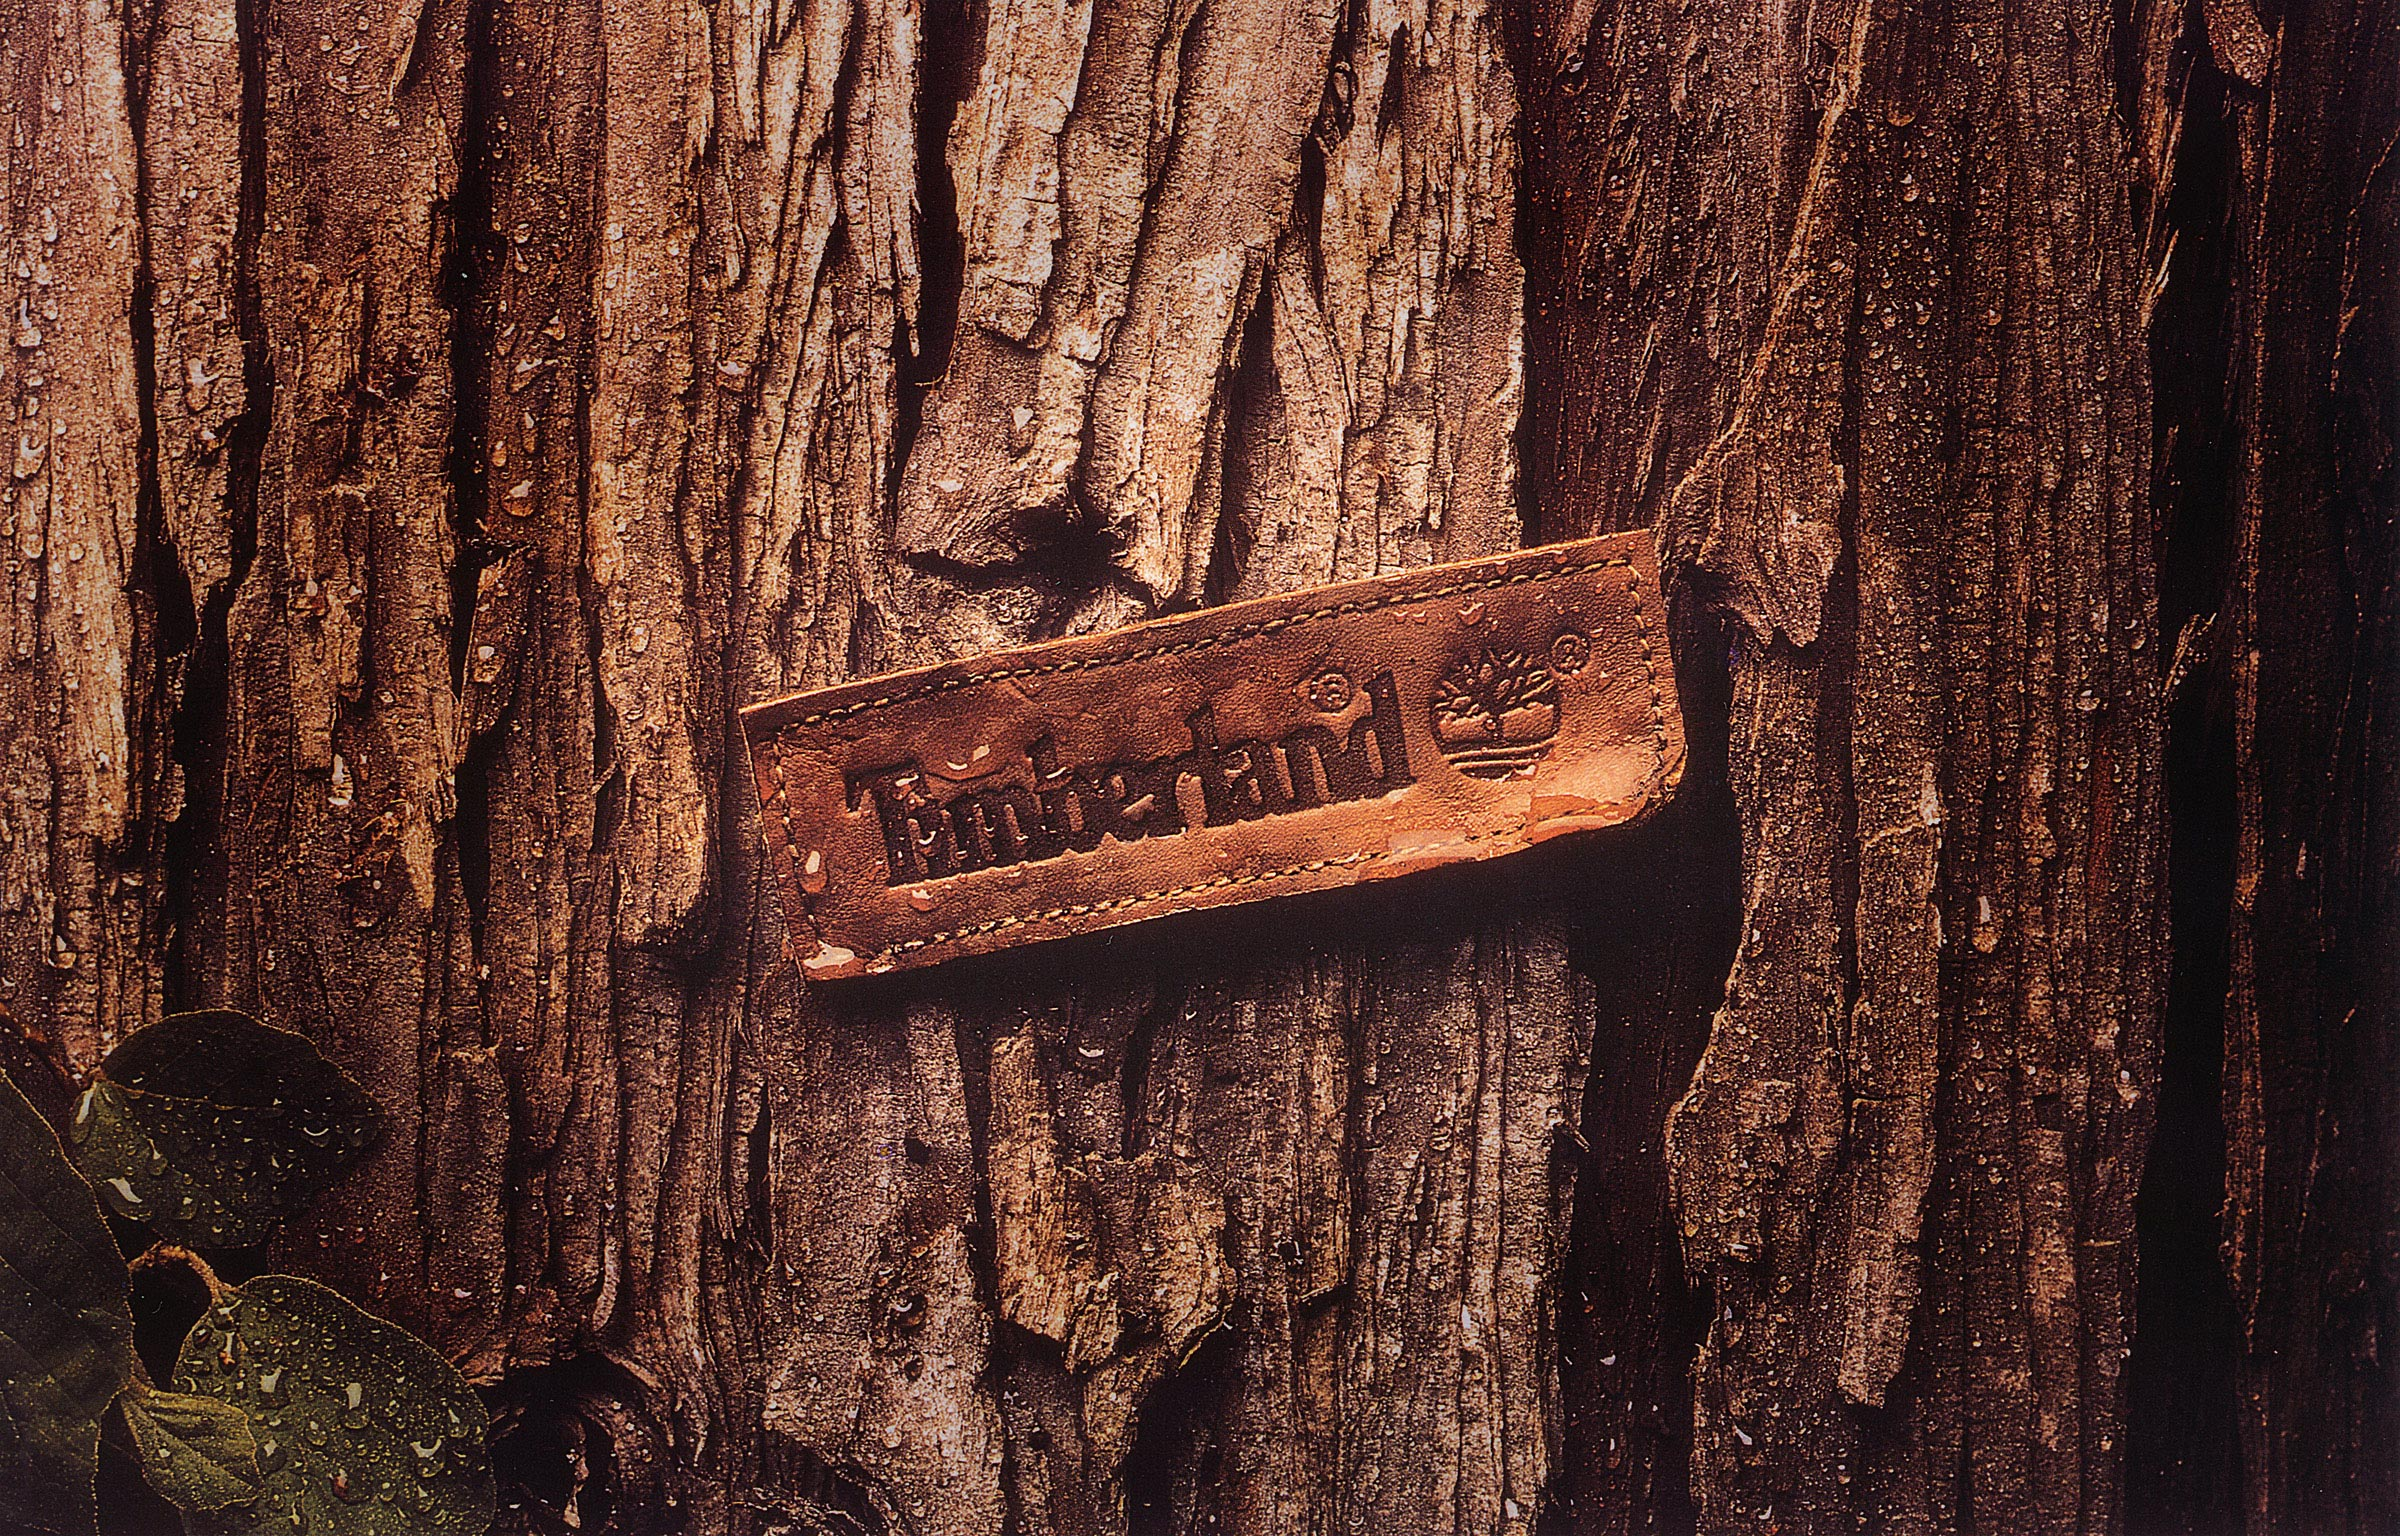 Timberland  Label    Mullen Advertising  Anne Maloof & Margaret McGovern • creative _________________________________________________________